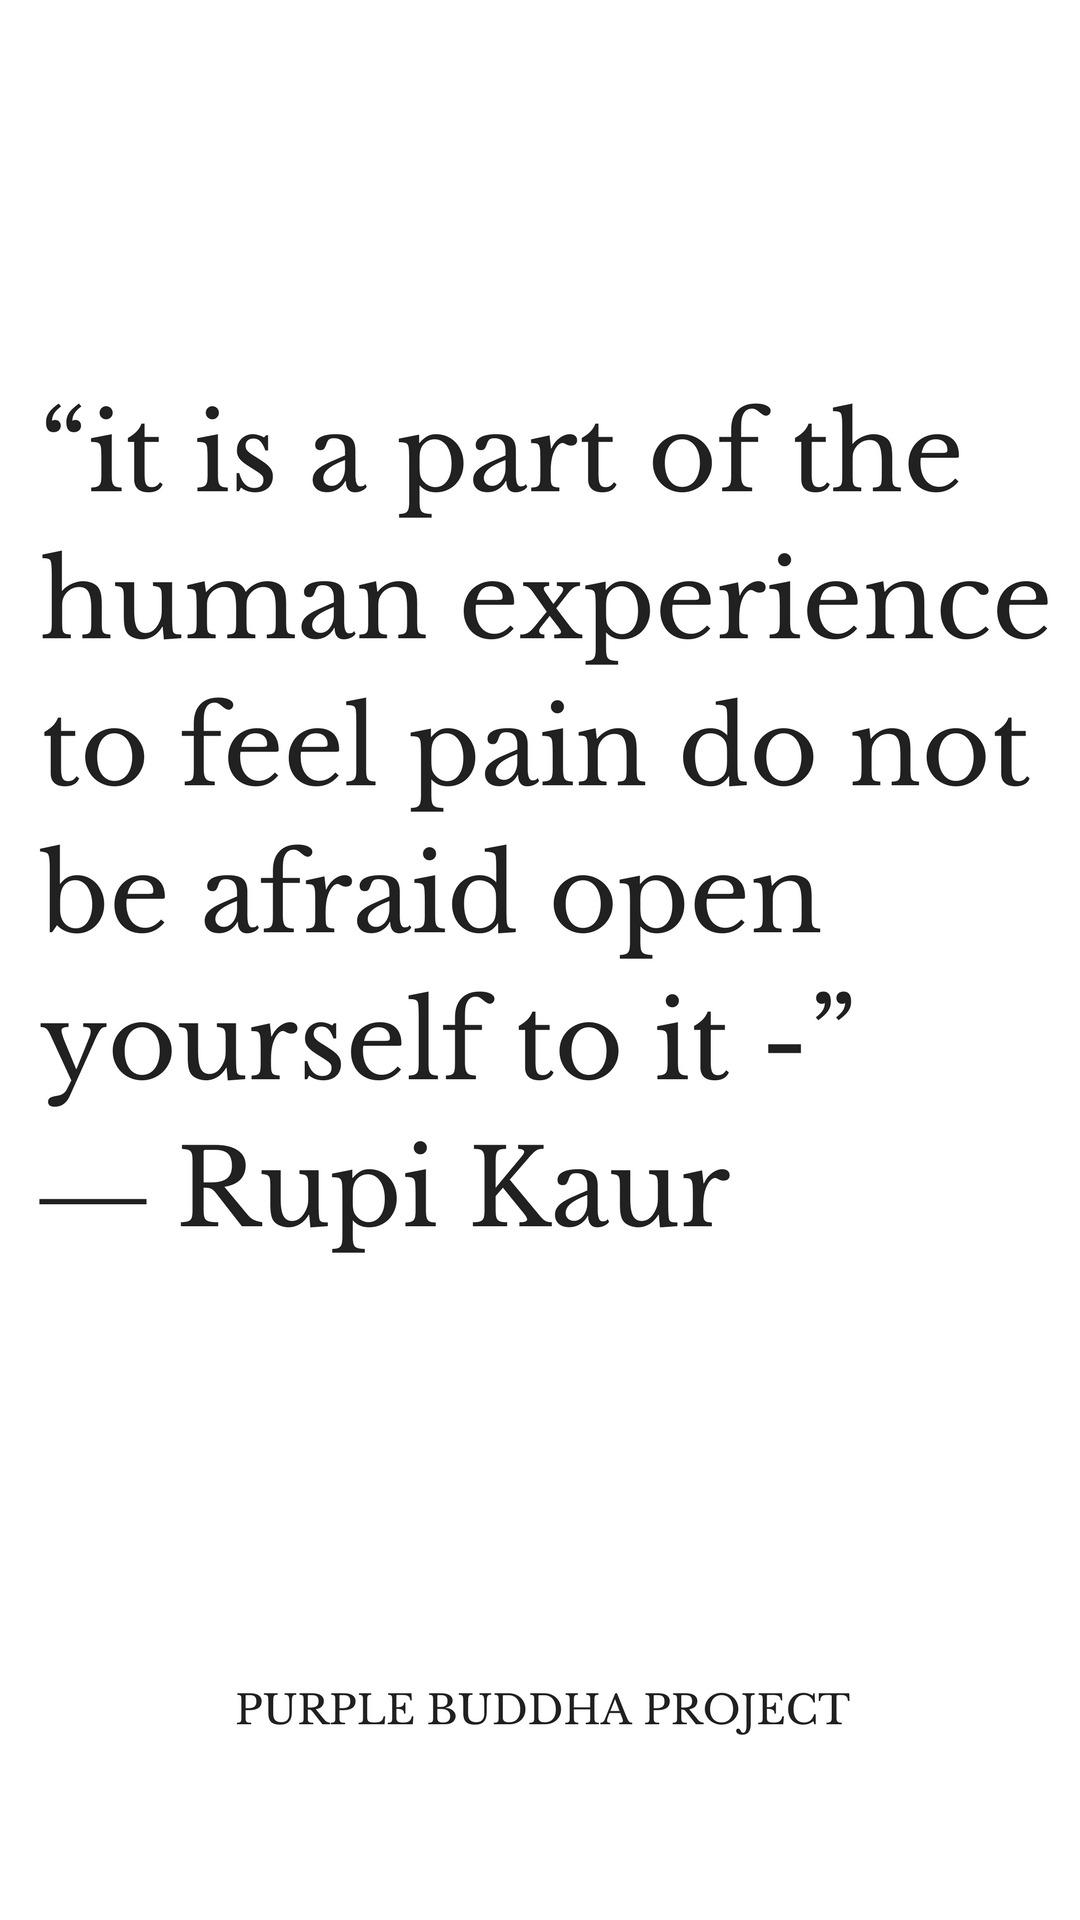 Purple Buddha Quotes Follow Purple Buddha Project Instagram For